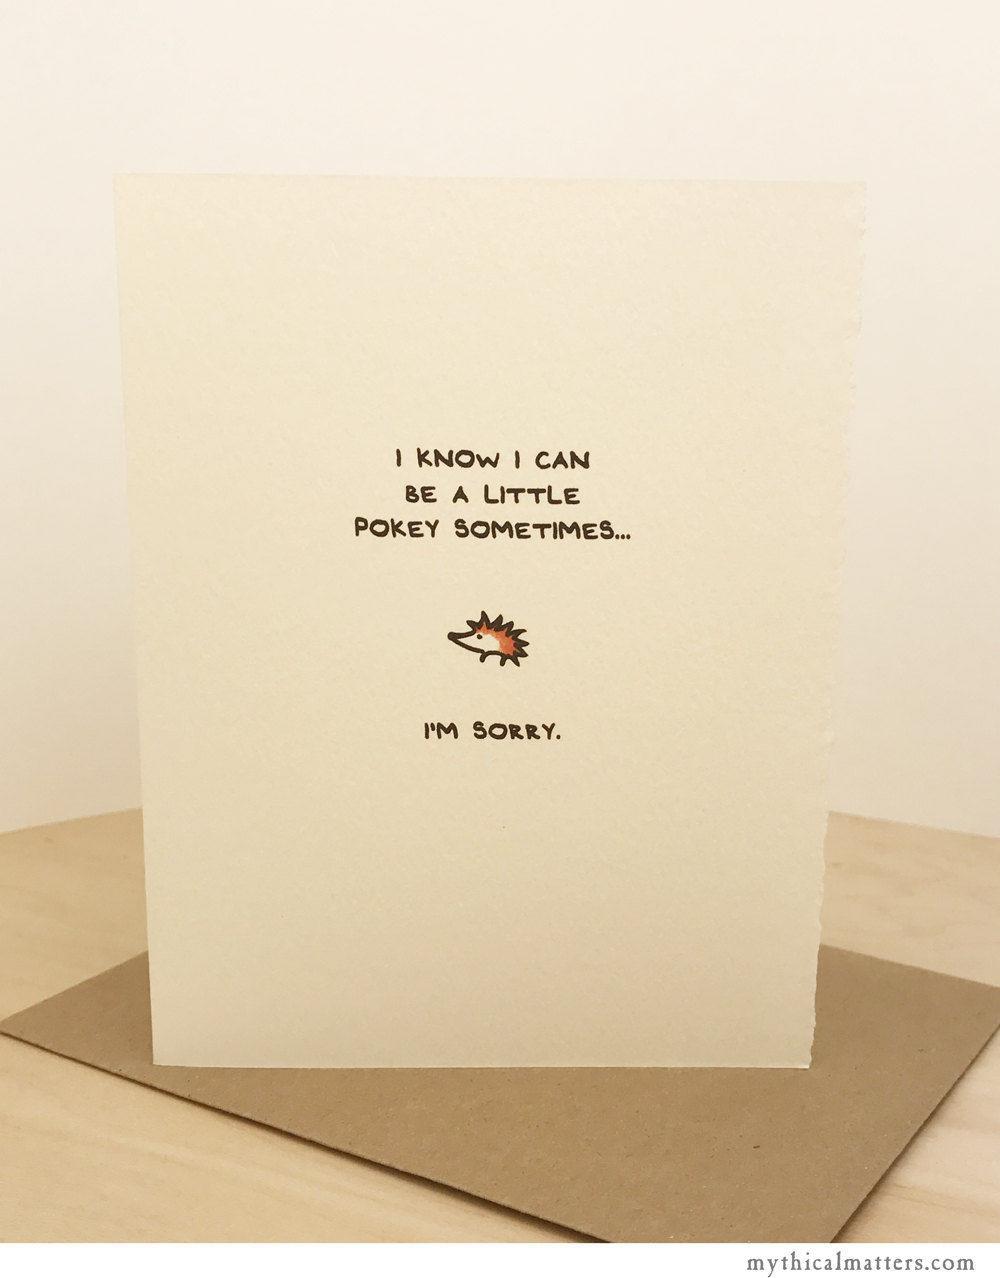 Im sorry card hedgehog greeting card cute adorable paper made in im sorry card hedgehog greeting card cute adorable paper made in canada toronto apology cute pokey animal enfrancais kristyandbryce Gallery